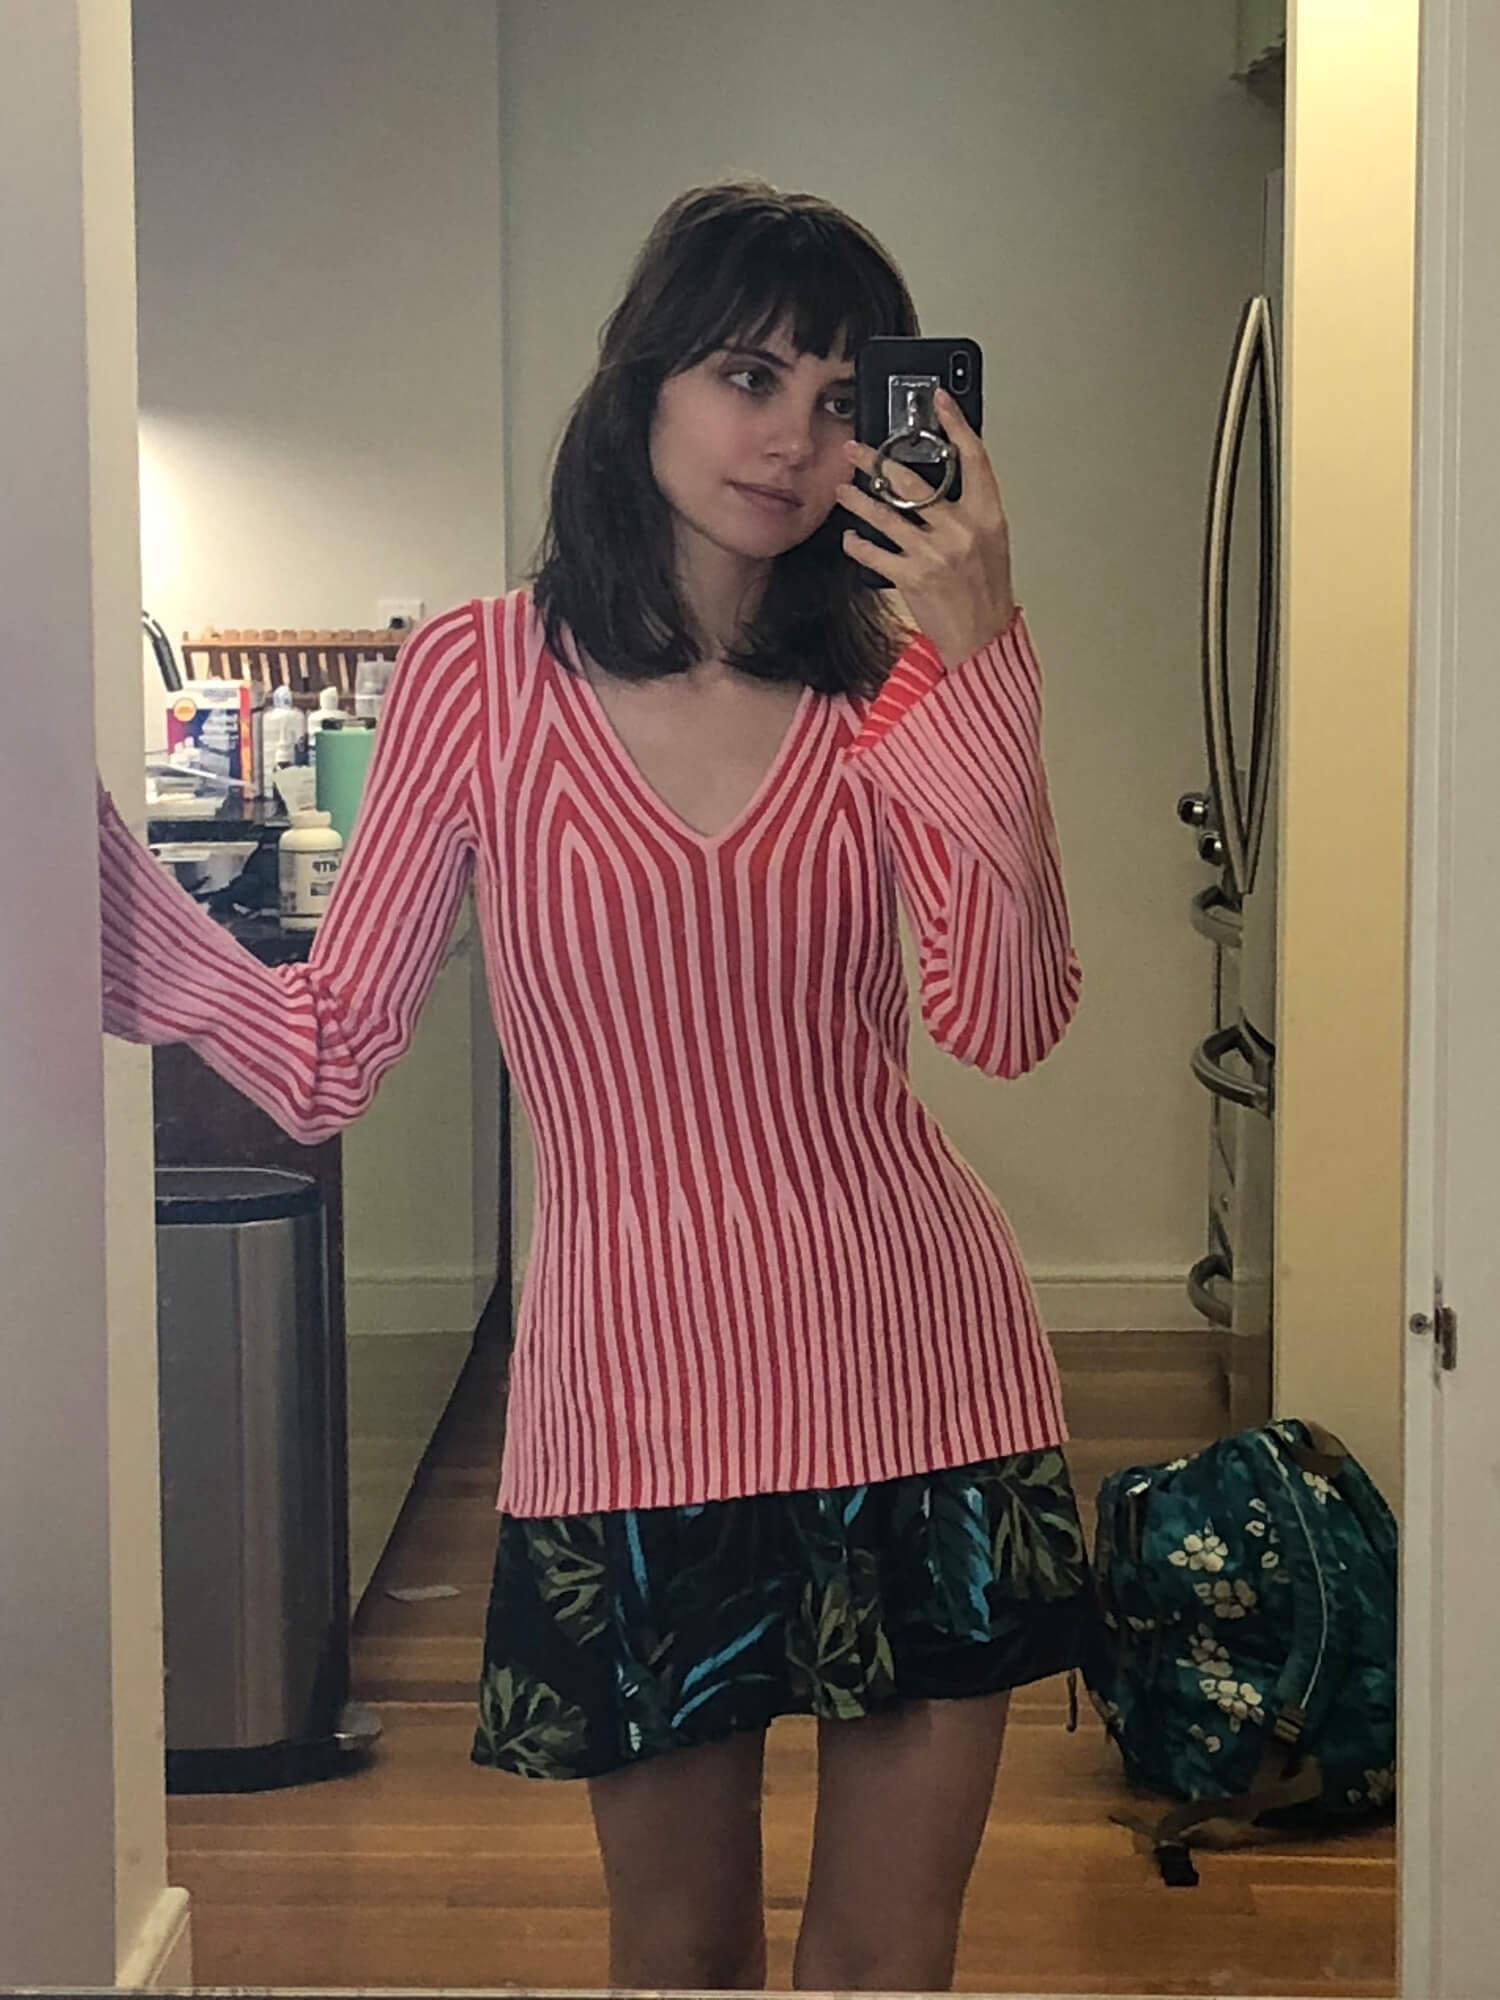 https://liararoux.xxx/wp-content/uploads/2018/10/Liara-Roux-Selfies-and-Snapshots-September-2018-044.jpg